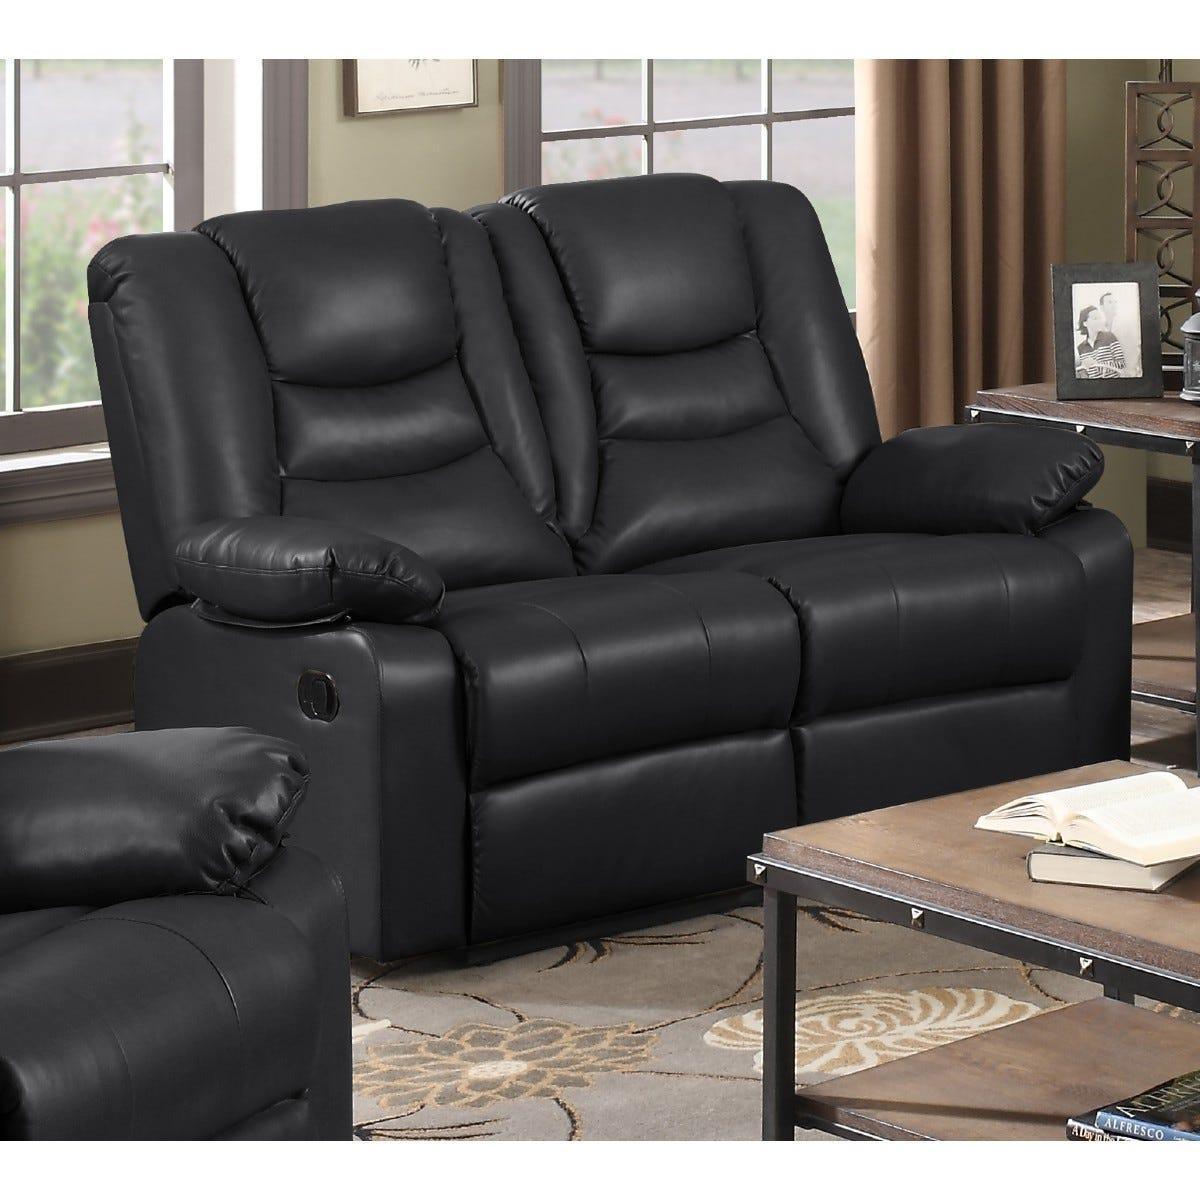 Kington LeatherGel and Faux Leather Reclining 2 Seater Sofa Black